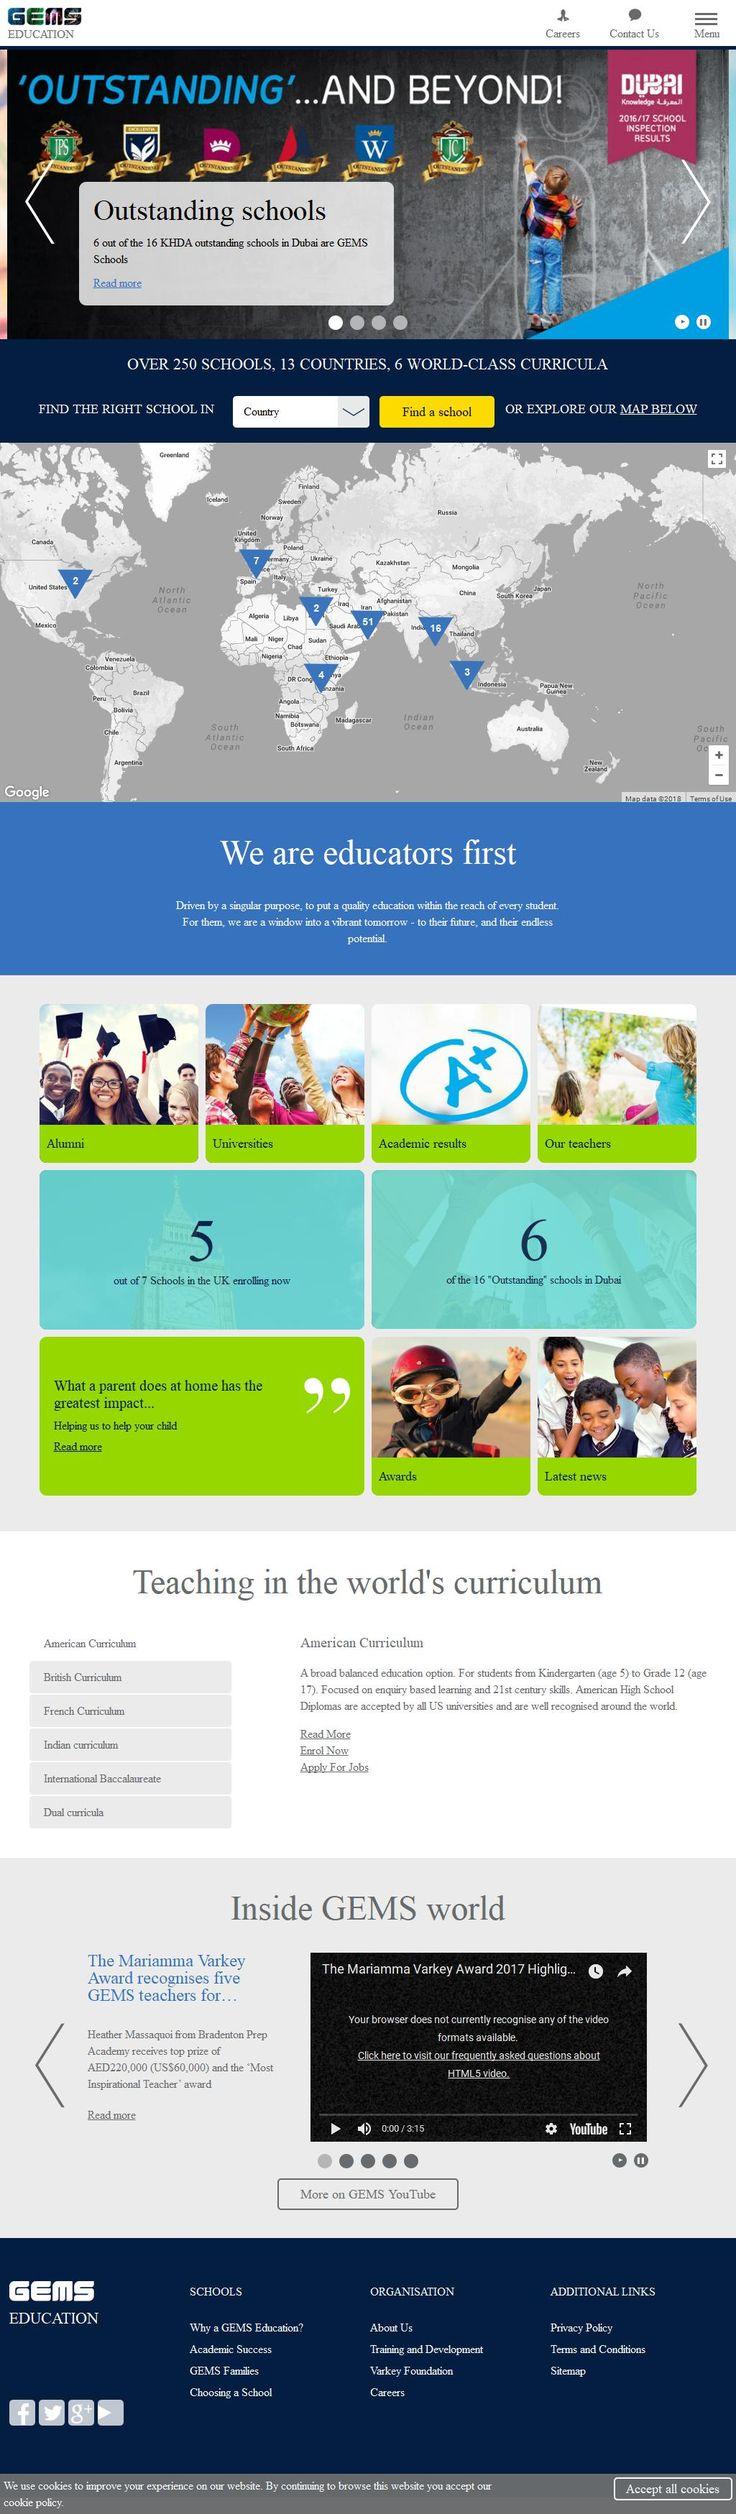 Gems Education Gems Education 745 Sheikh Zayed